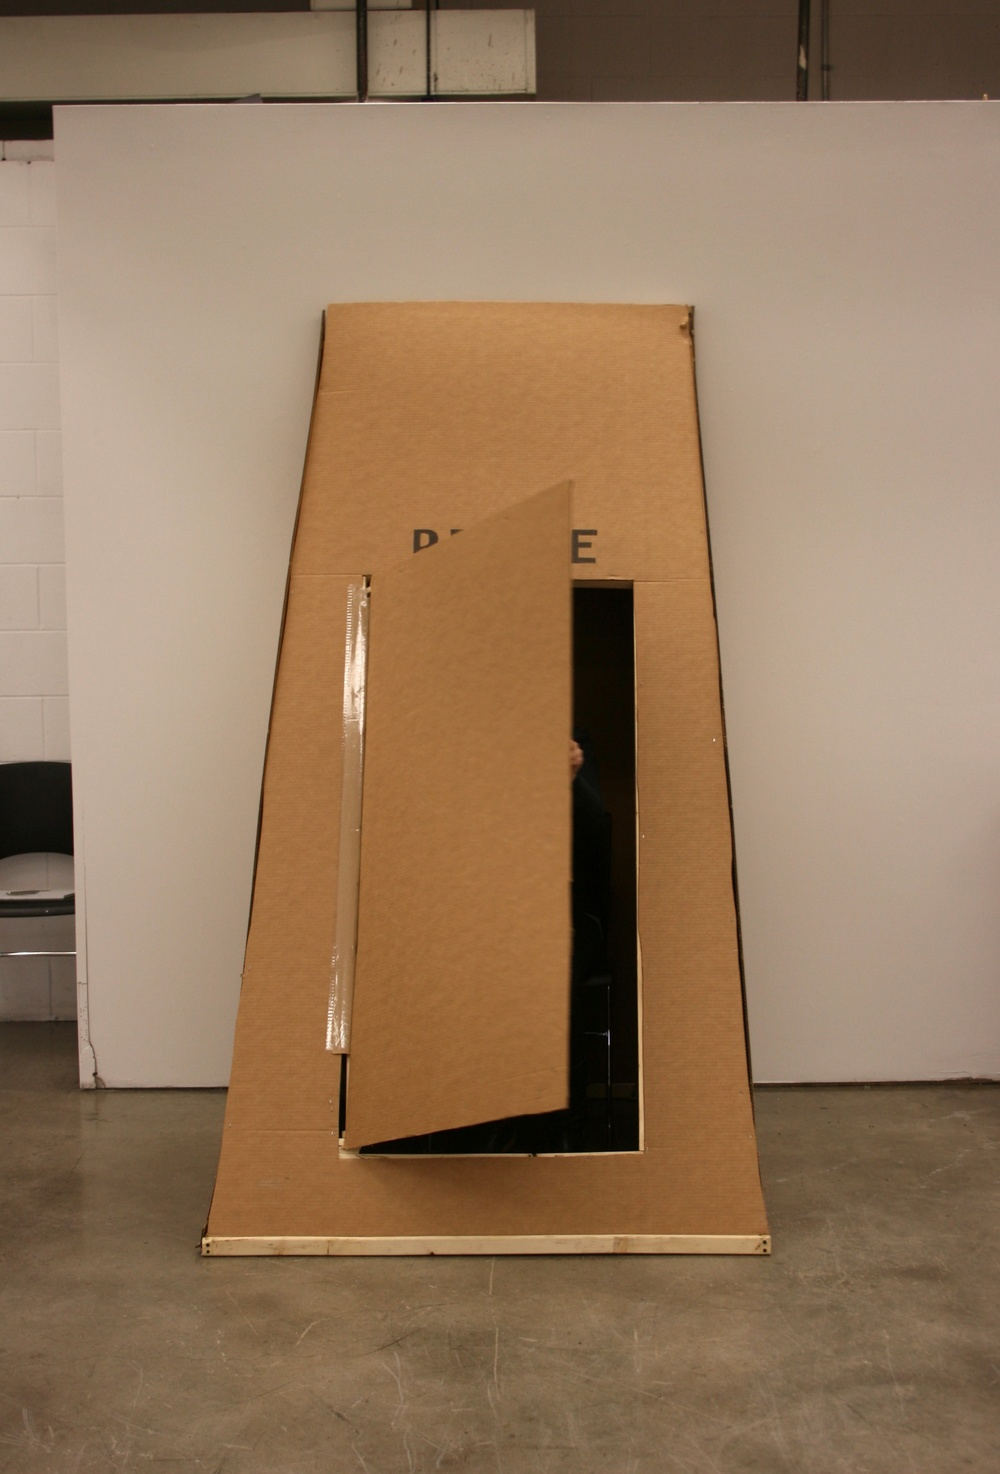 02-TB-2014-Panel Crit-Refuge Box.JPG